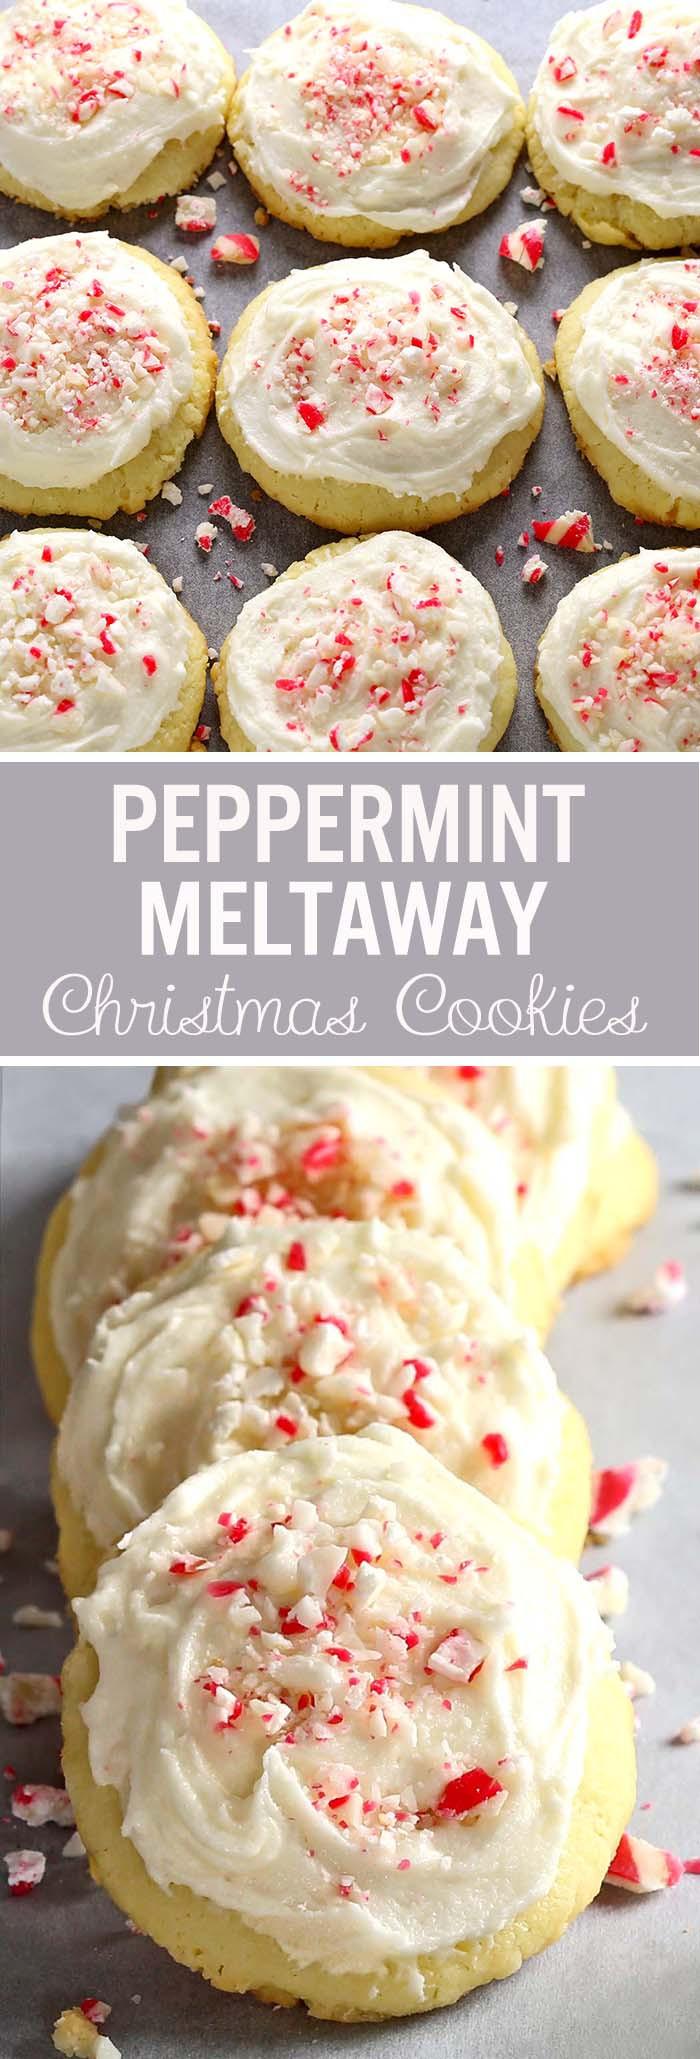 Christmas Meltaway Cookies  Peppermint Meltaway Cookies Cakescottage